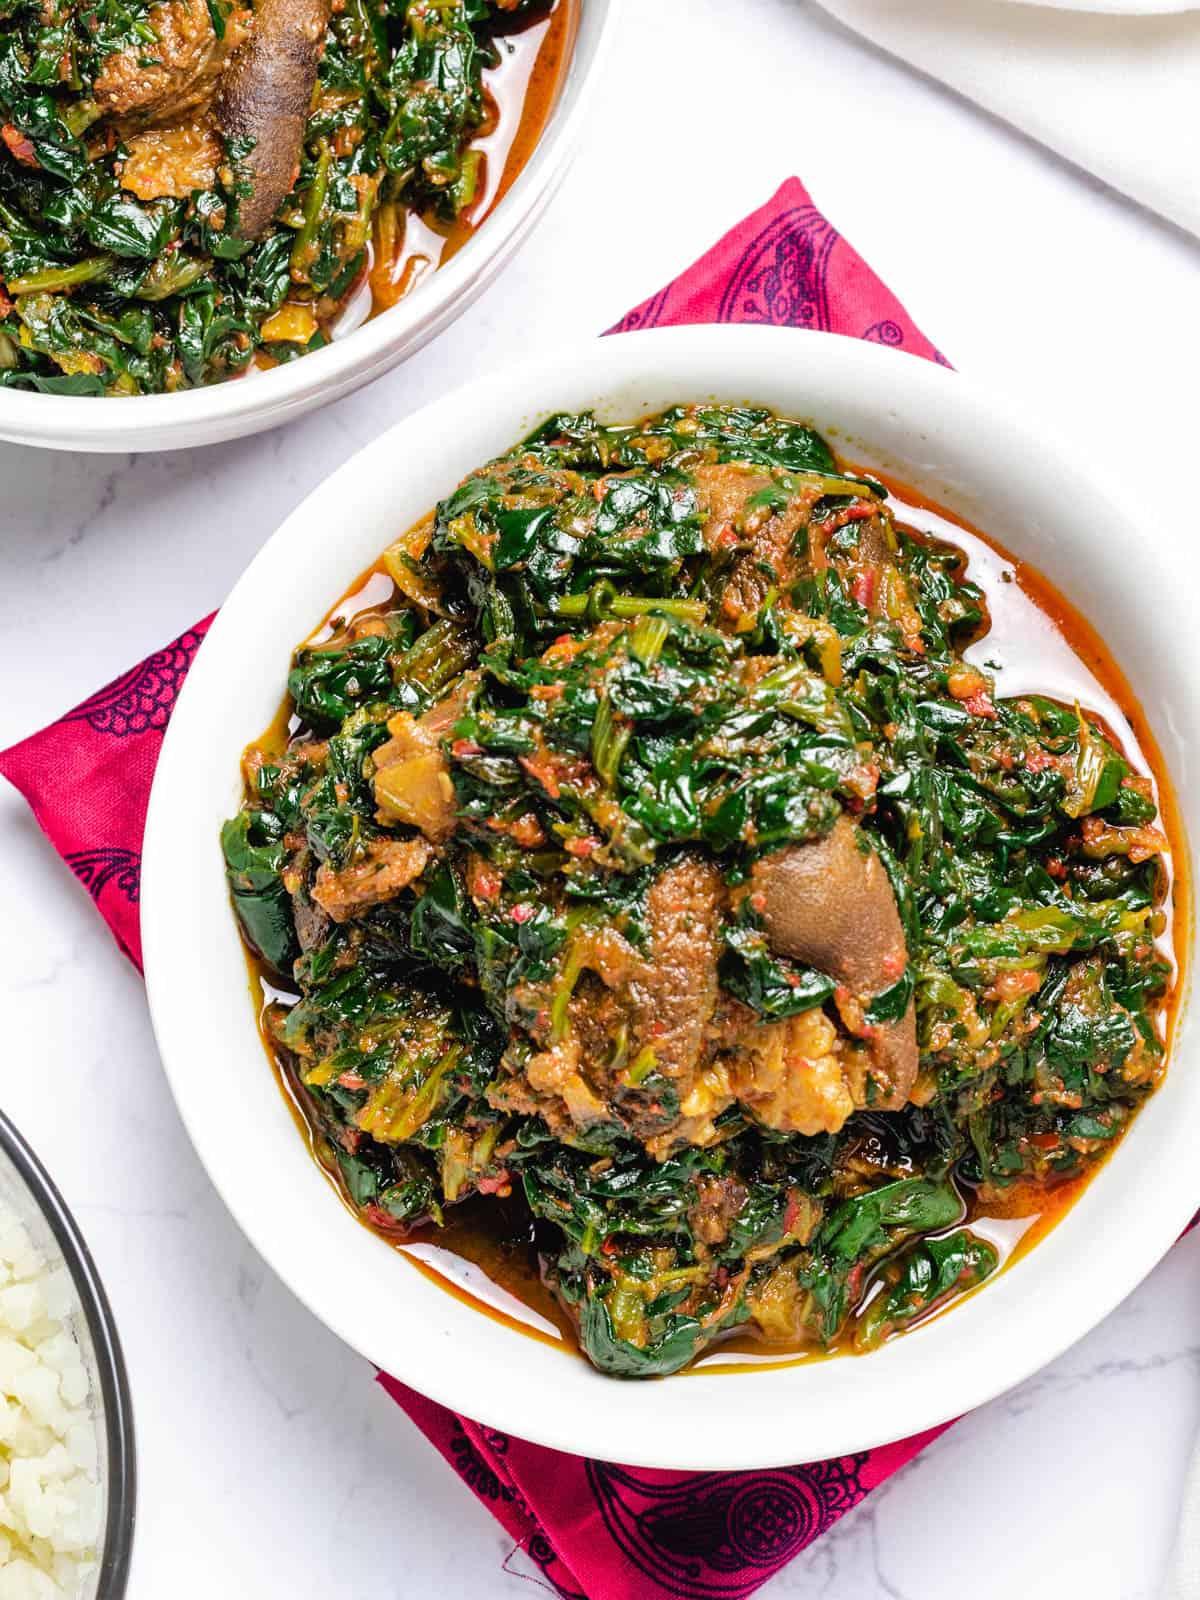 nigerian spinach stew in a white bowl